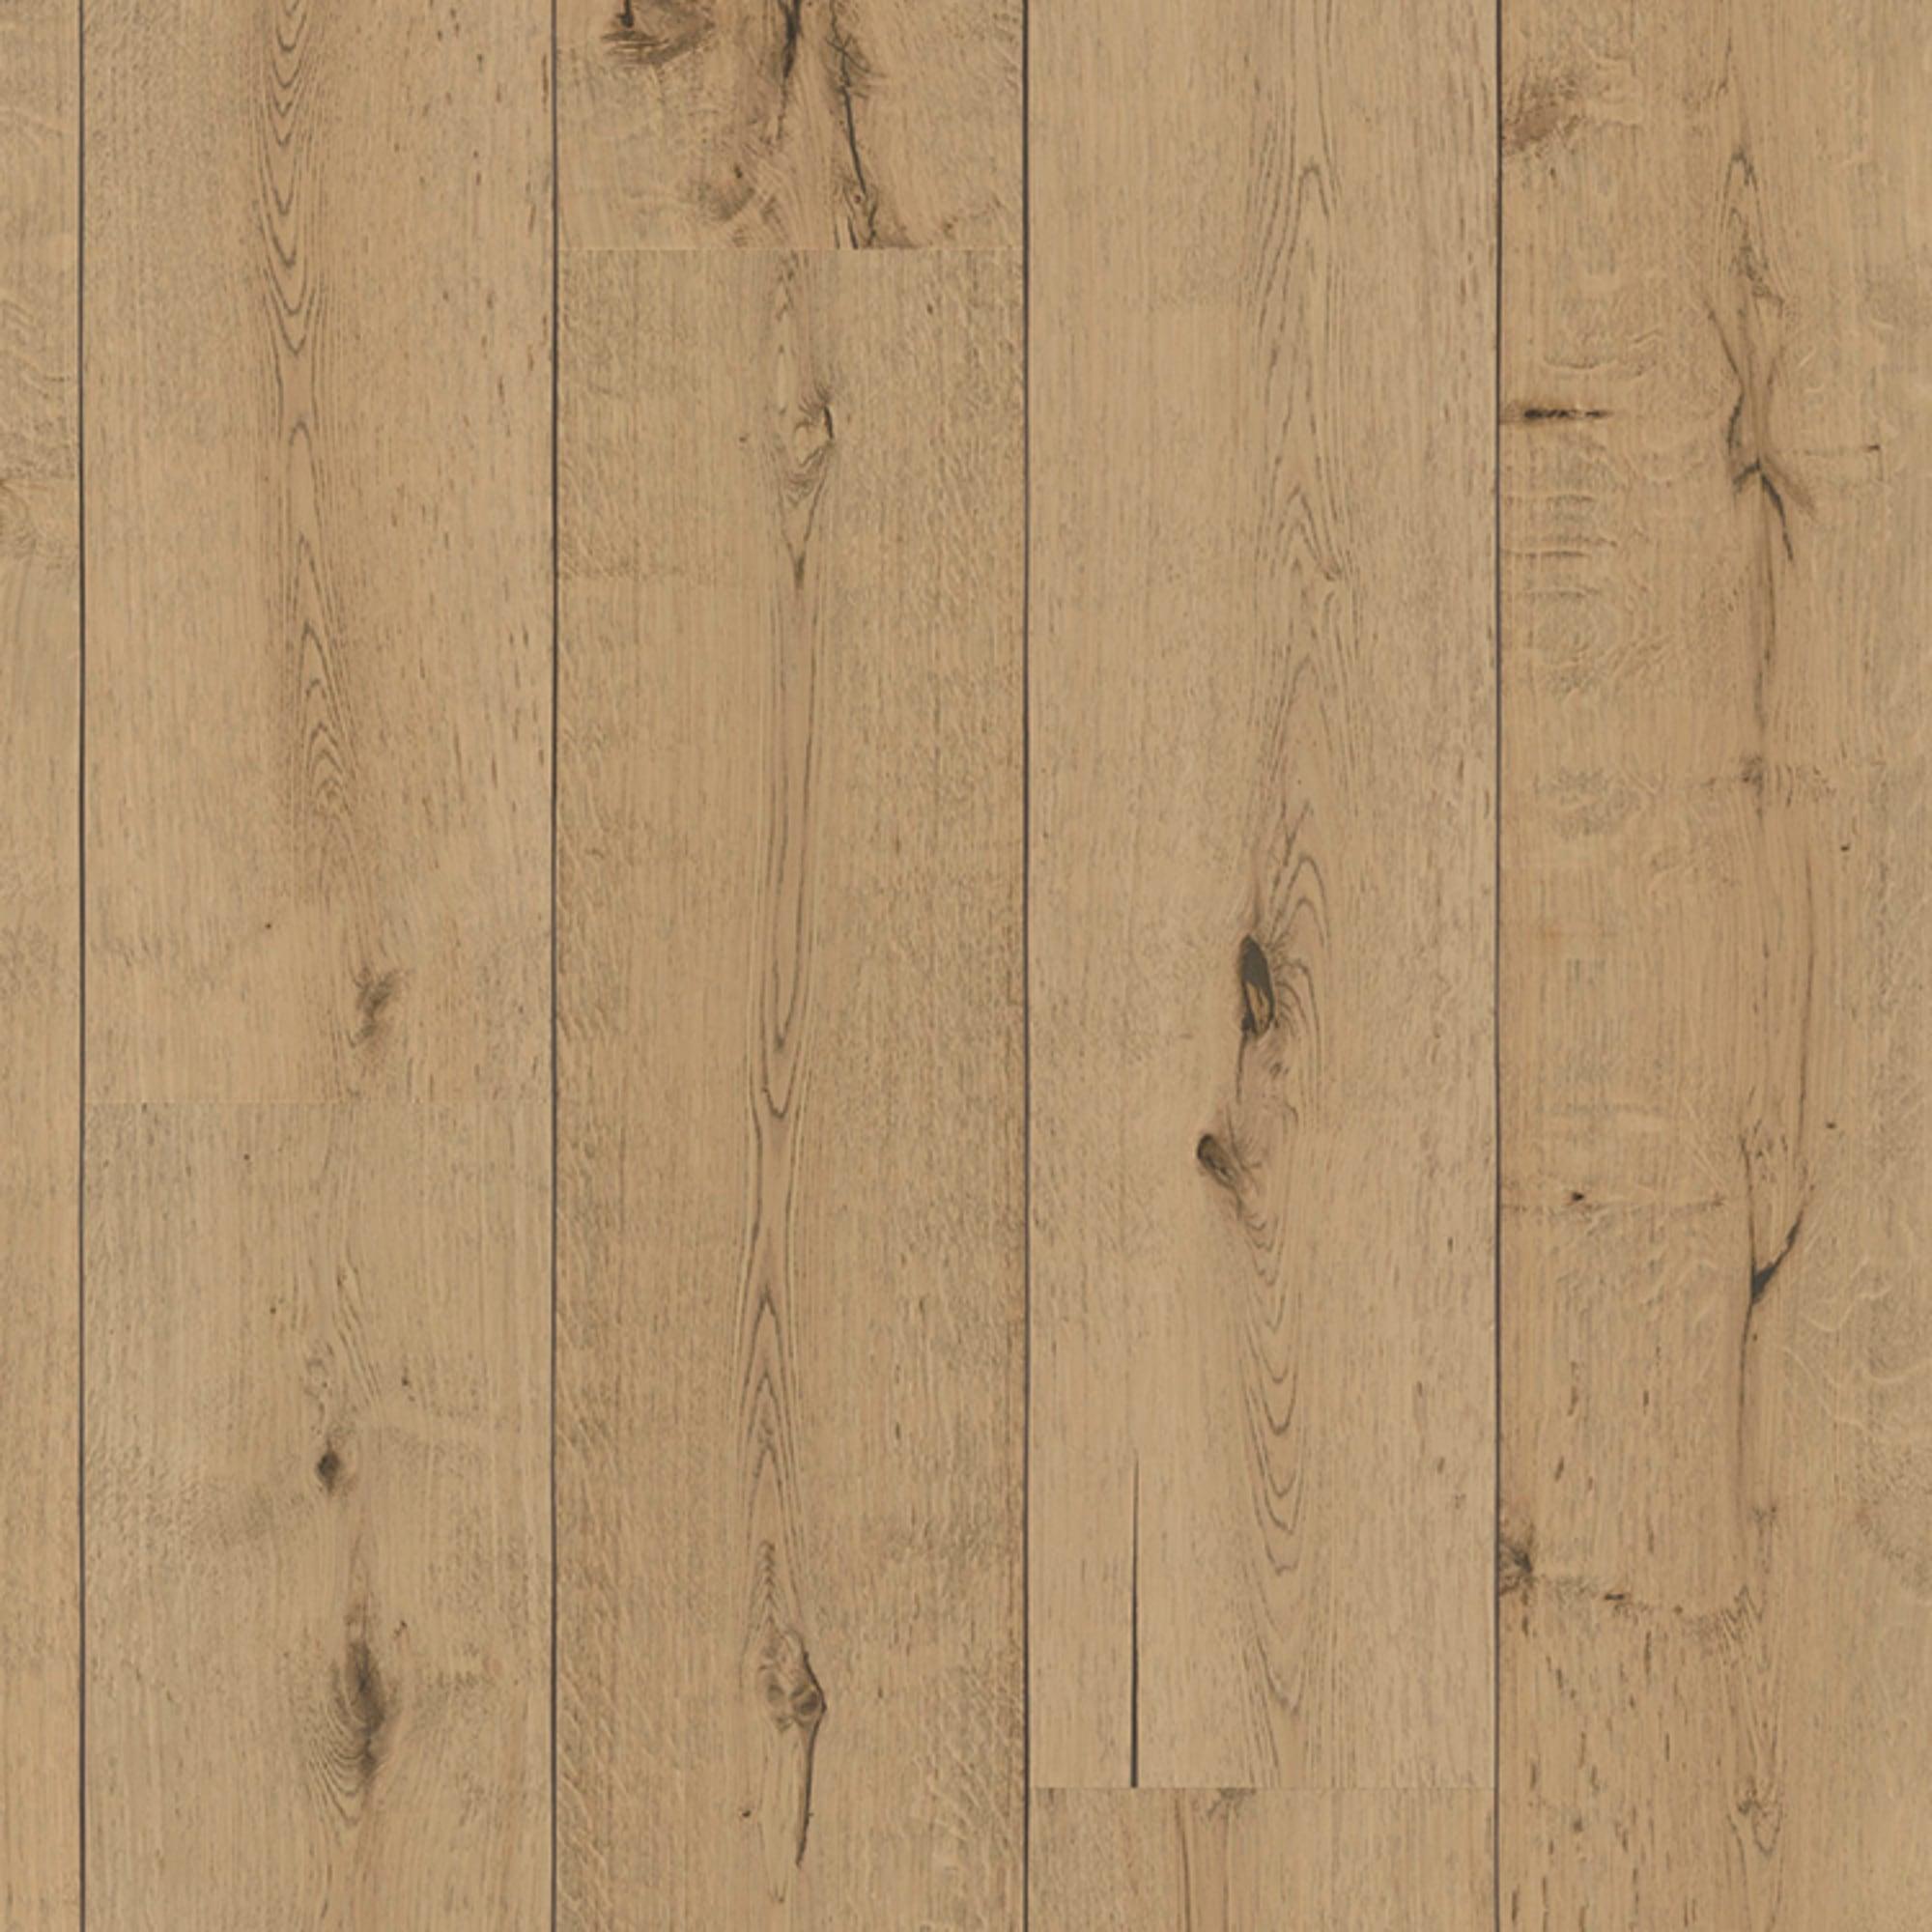 Rustic Wood Flooring Wood Flooring Hd300 Lindura 11x270mm Cafe Latte Rustic Wood